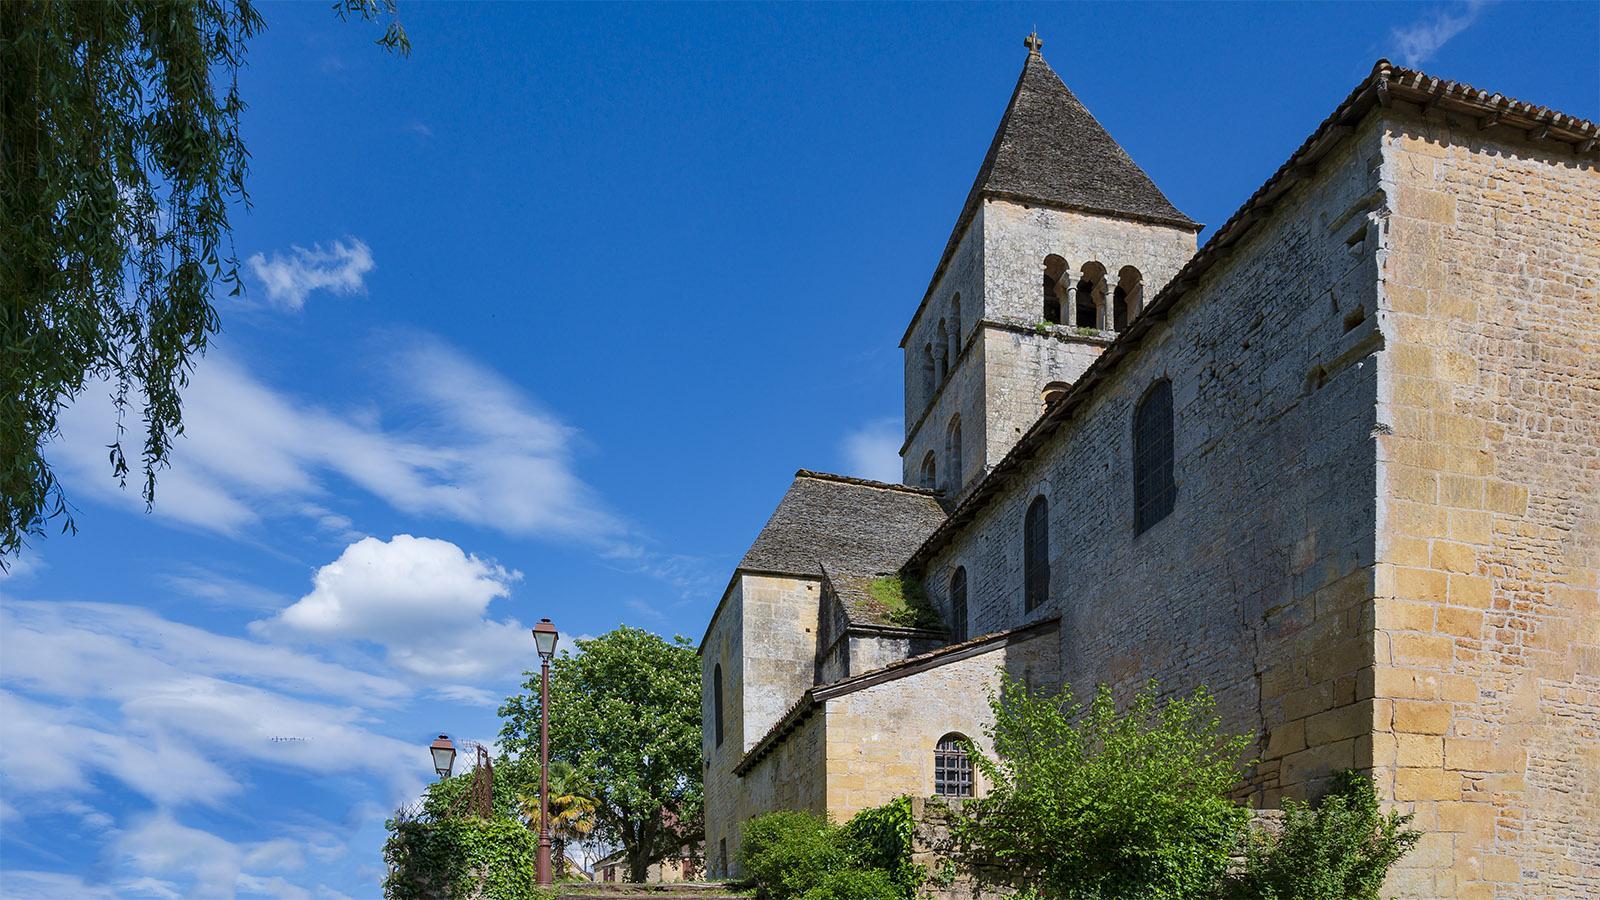 Die <em>église Saint-Léonce</em> erhebt sich am Ufer der Vézère. Foto: Hilke Maunder